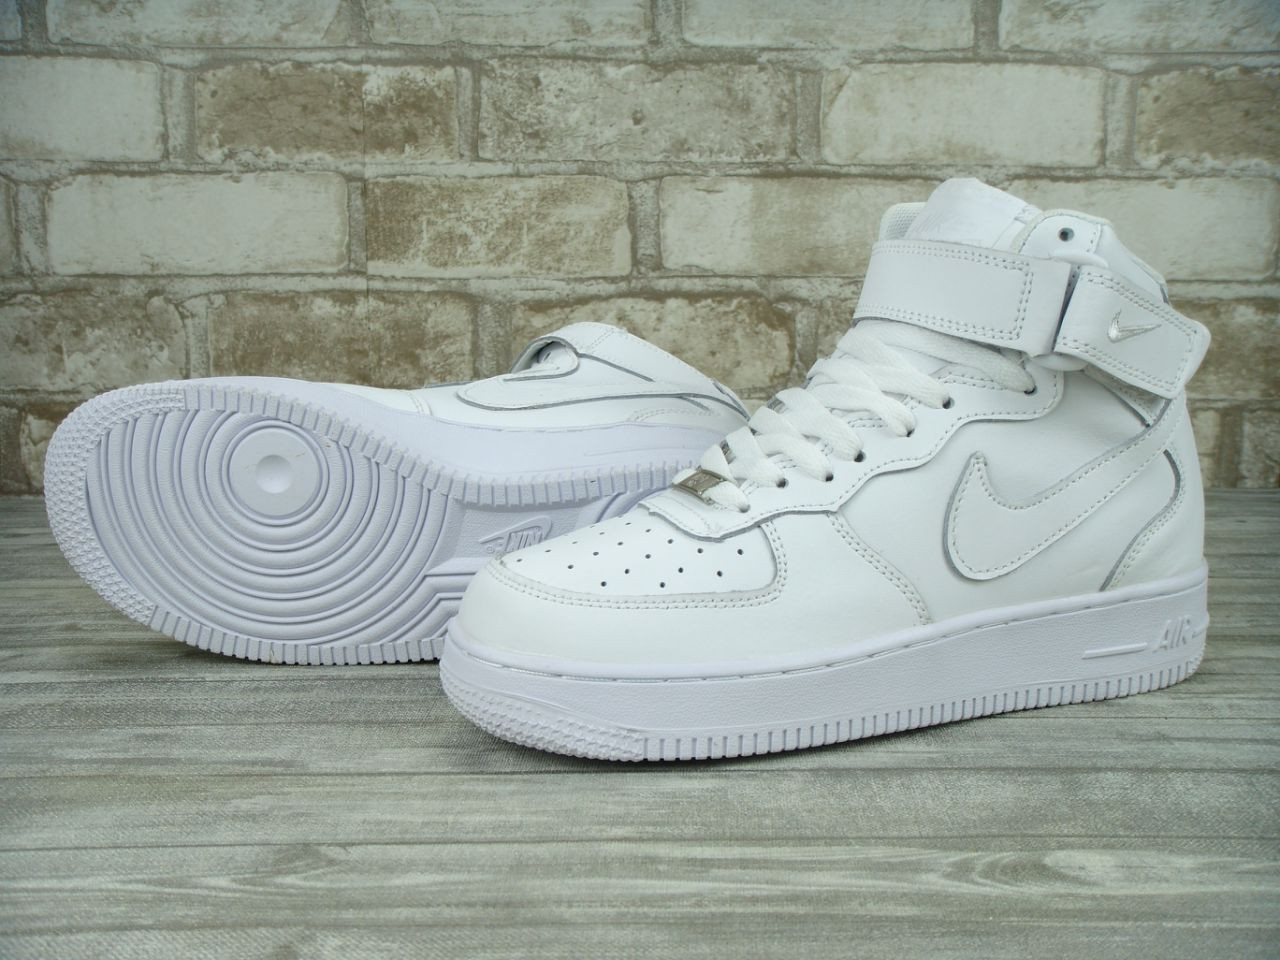 Кроссовки Nike Air Force High белые унисекс (Реплика ААА+)  продажа ... b4d4cd4e944